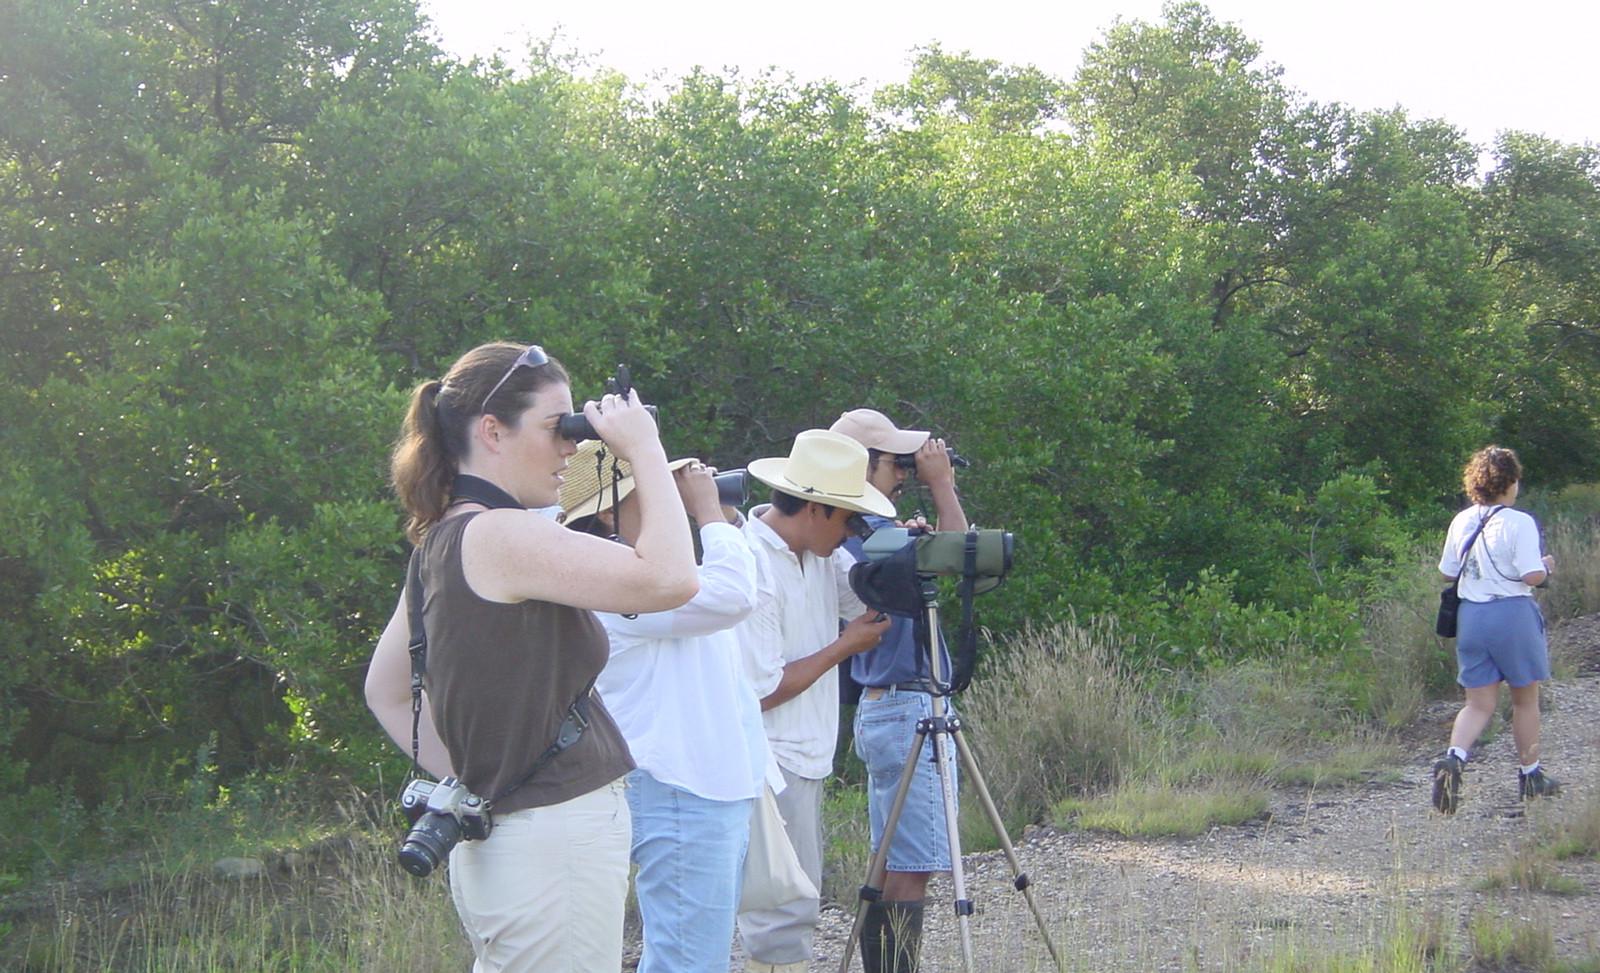 Inicio 2003. Observando aves